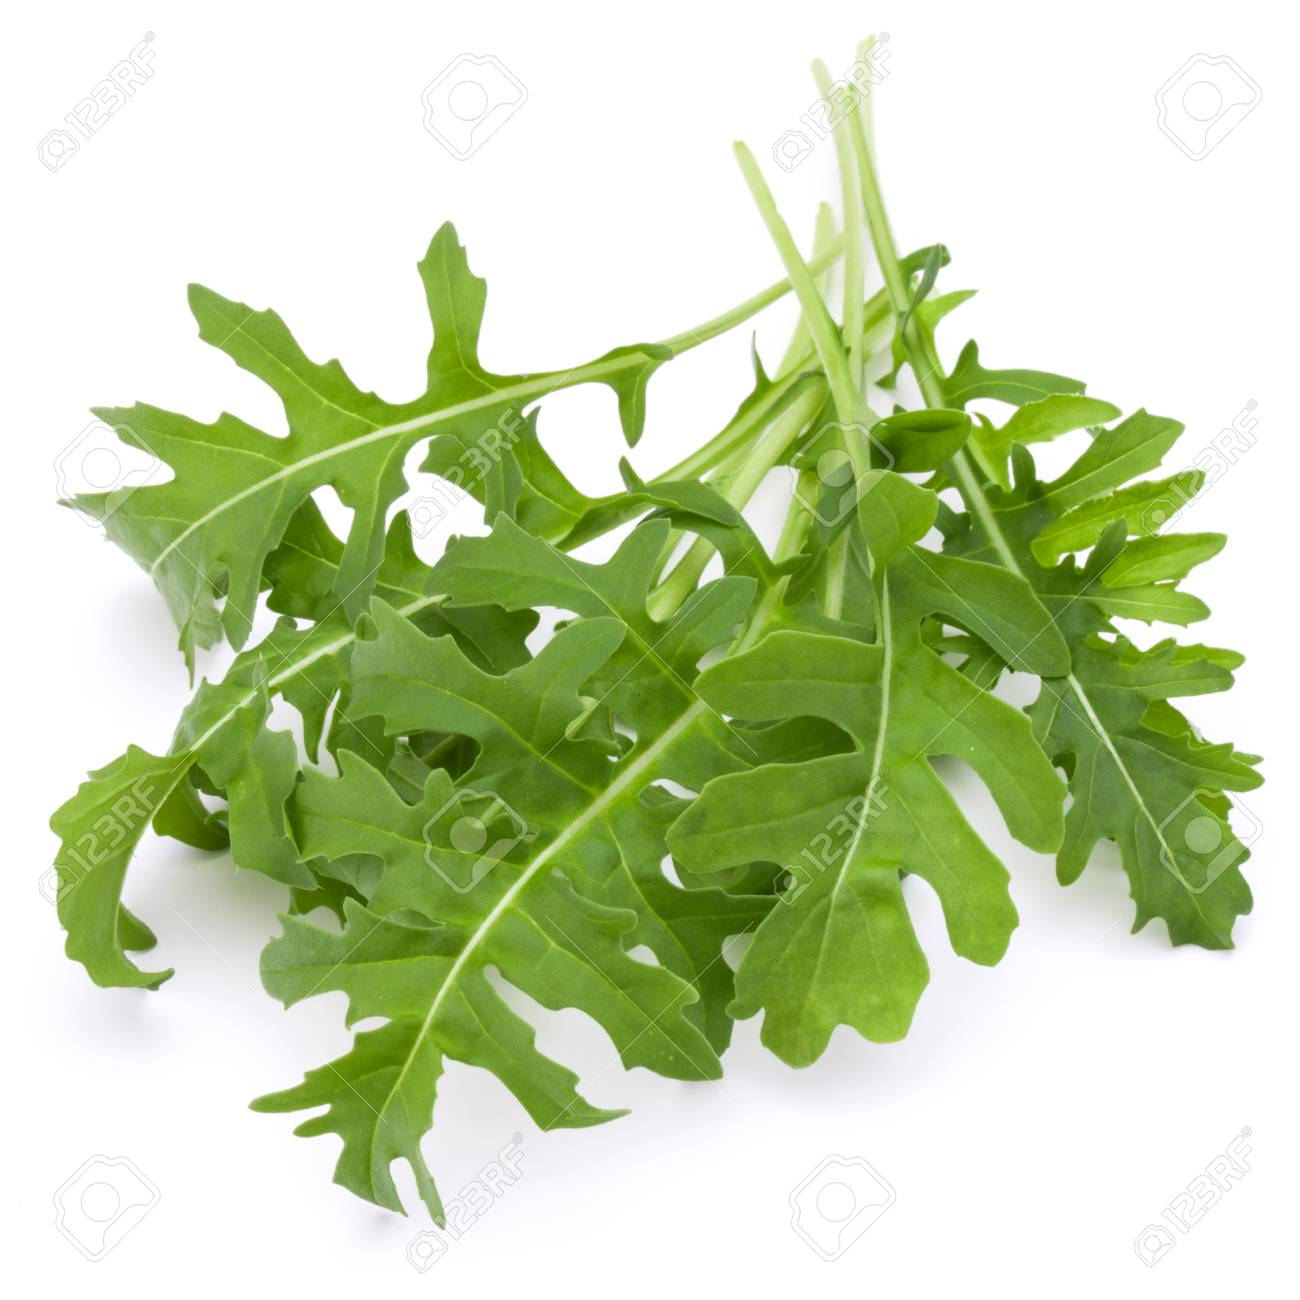 Close up studio shot of green fresh rucola leaves isolated on white background. Rocket salad or arugula. - 71273920